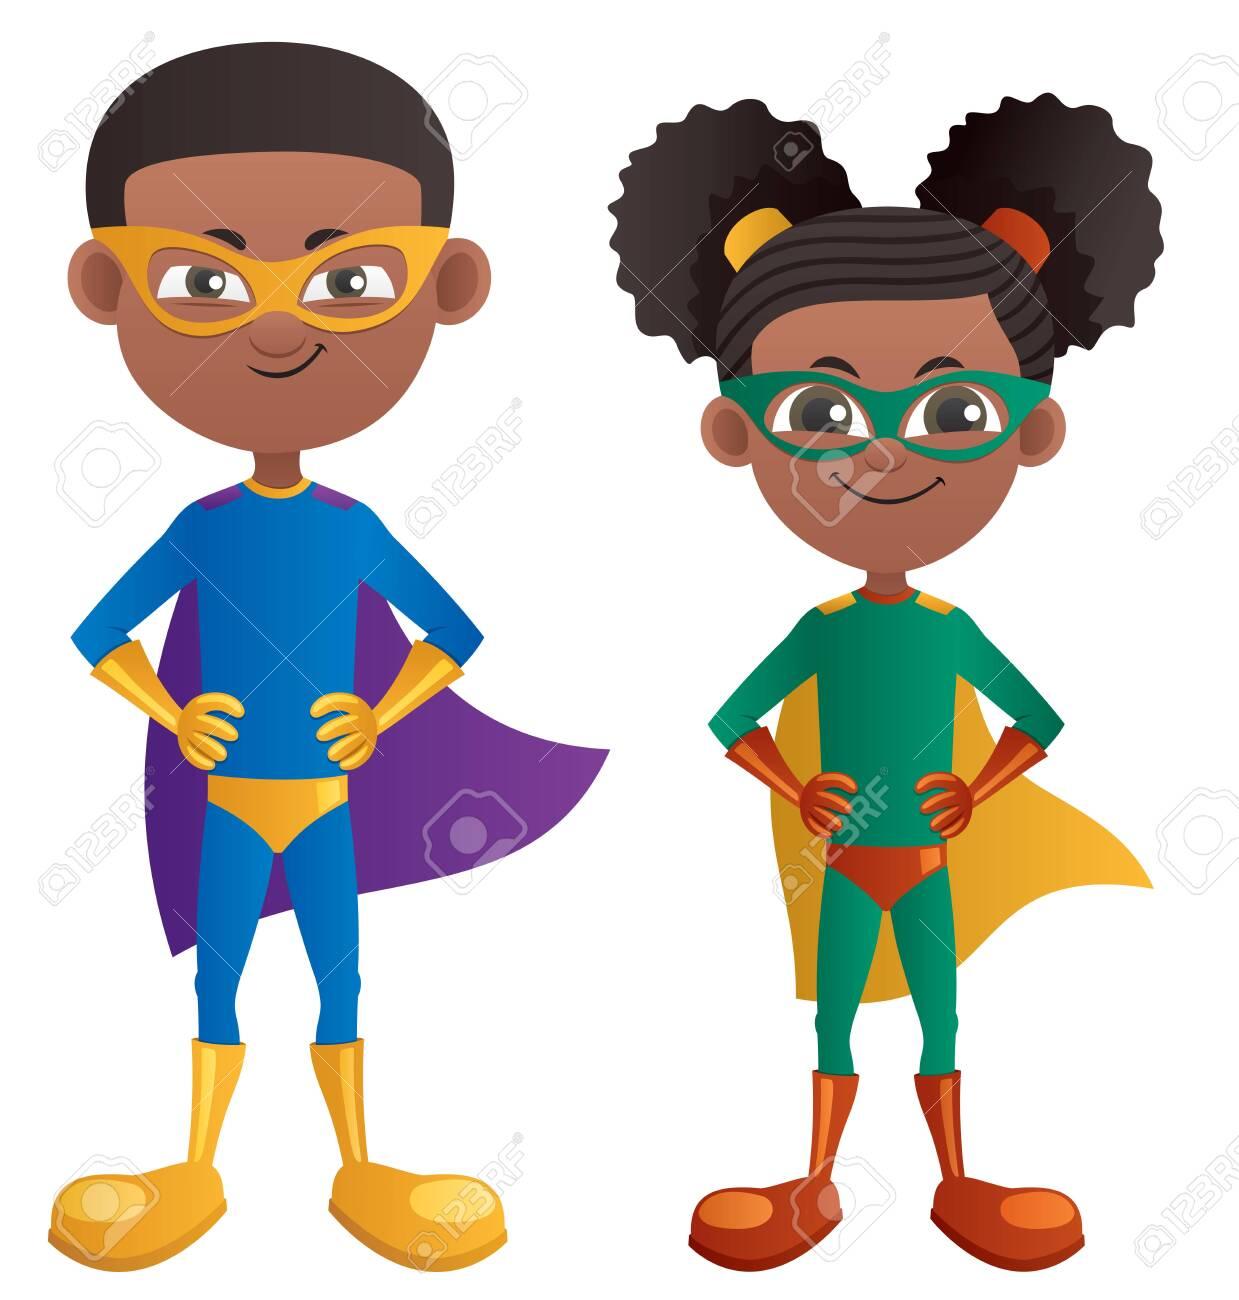 Illustration of cartoon super boy and super girl. - 128028091